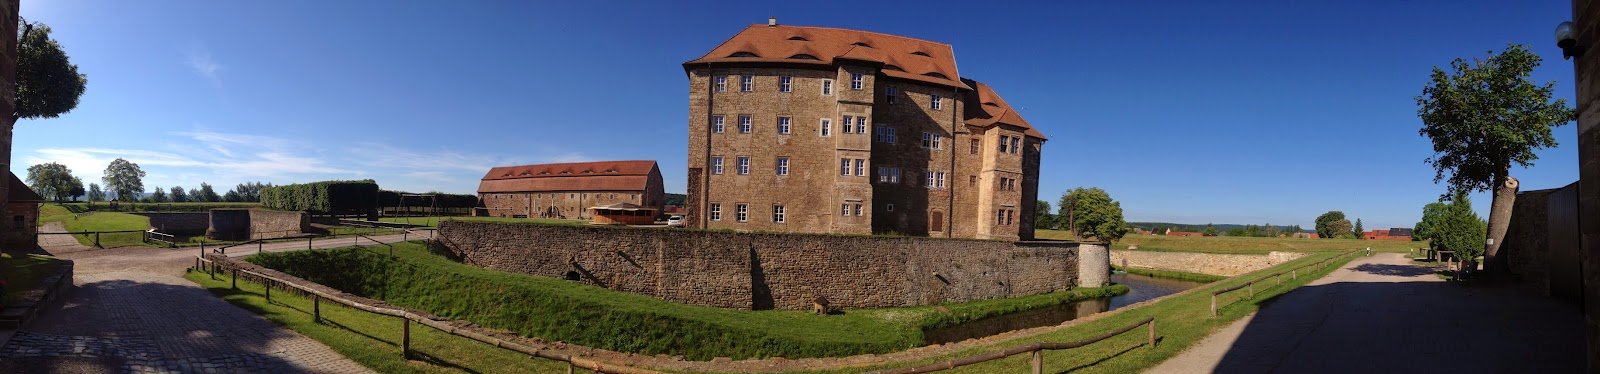 Panoramablick vom Burggraben